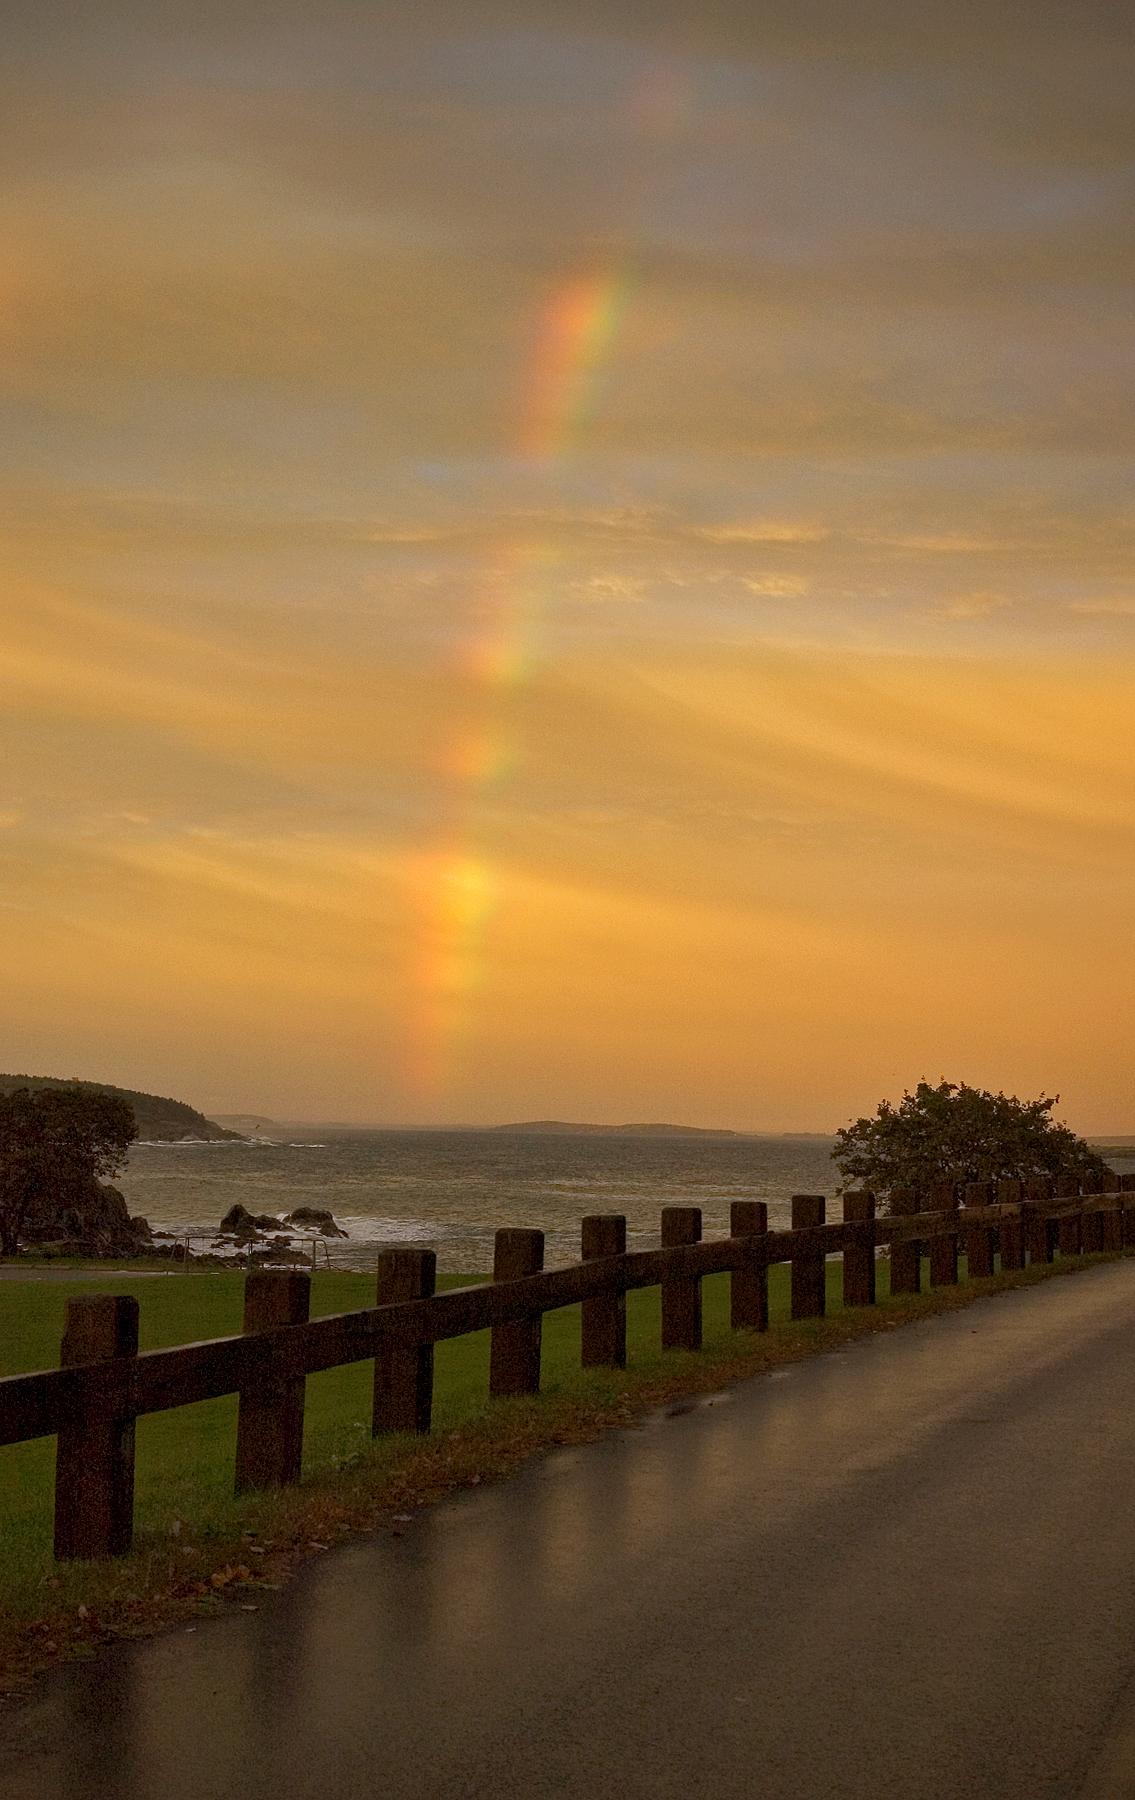 Chasing rainbows street reflection_3149